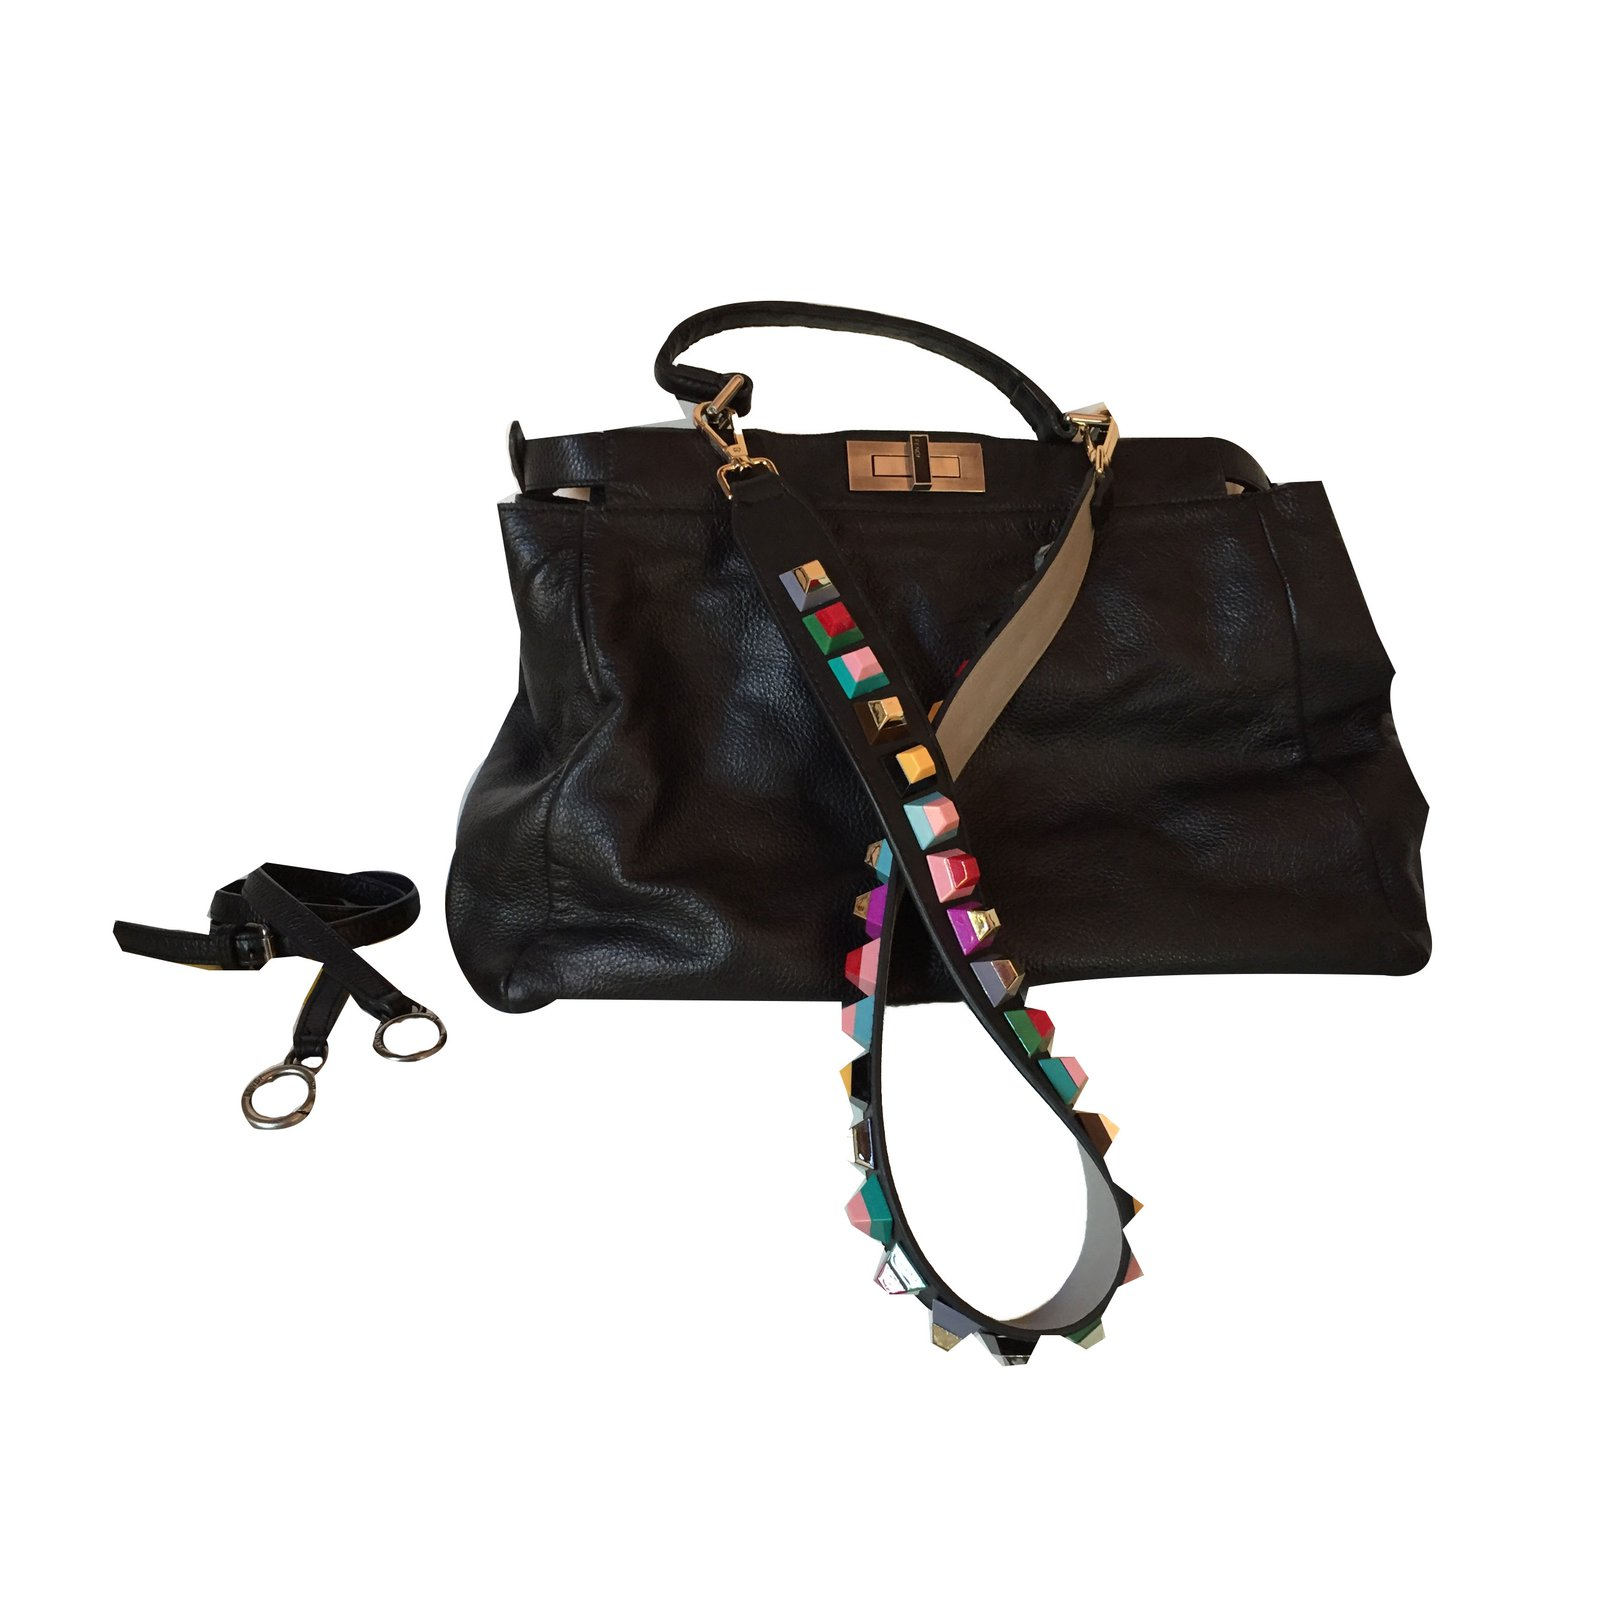 Fendi Fendi Peekaboo Handbags Leather Black ref.42702 - Joli Closet 67672164947b8